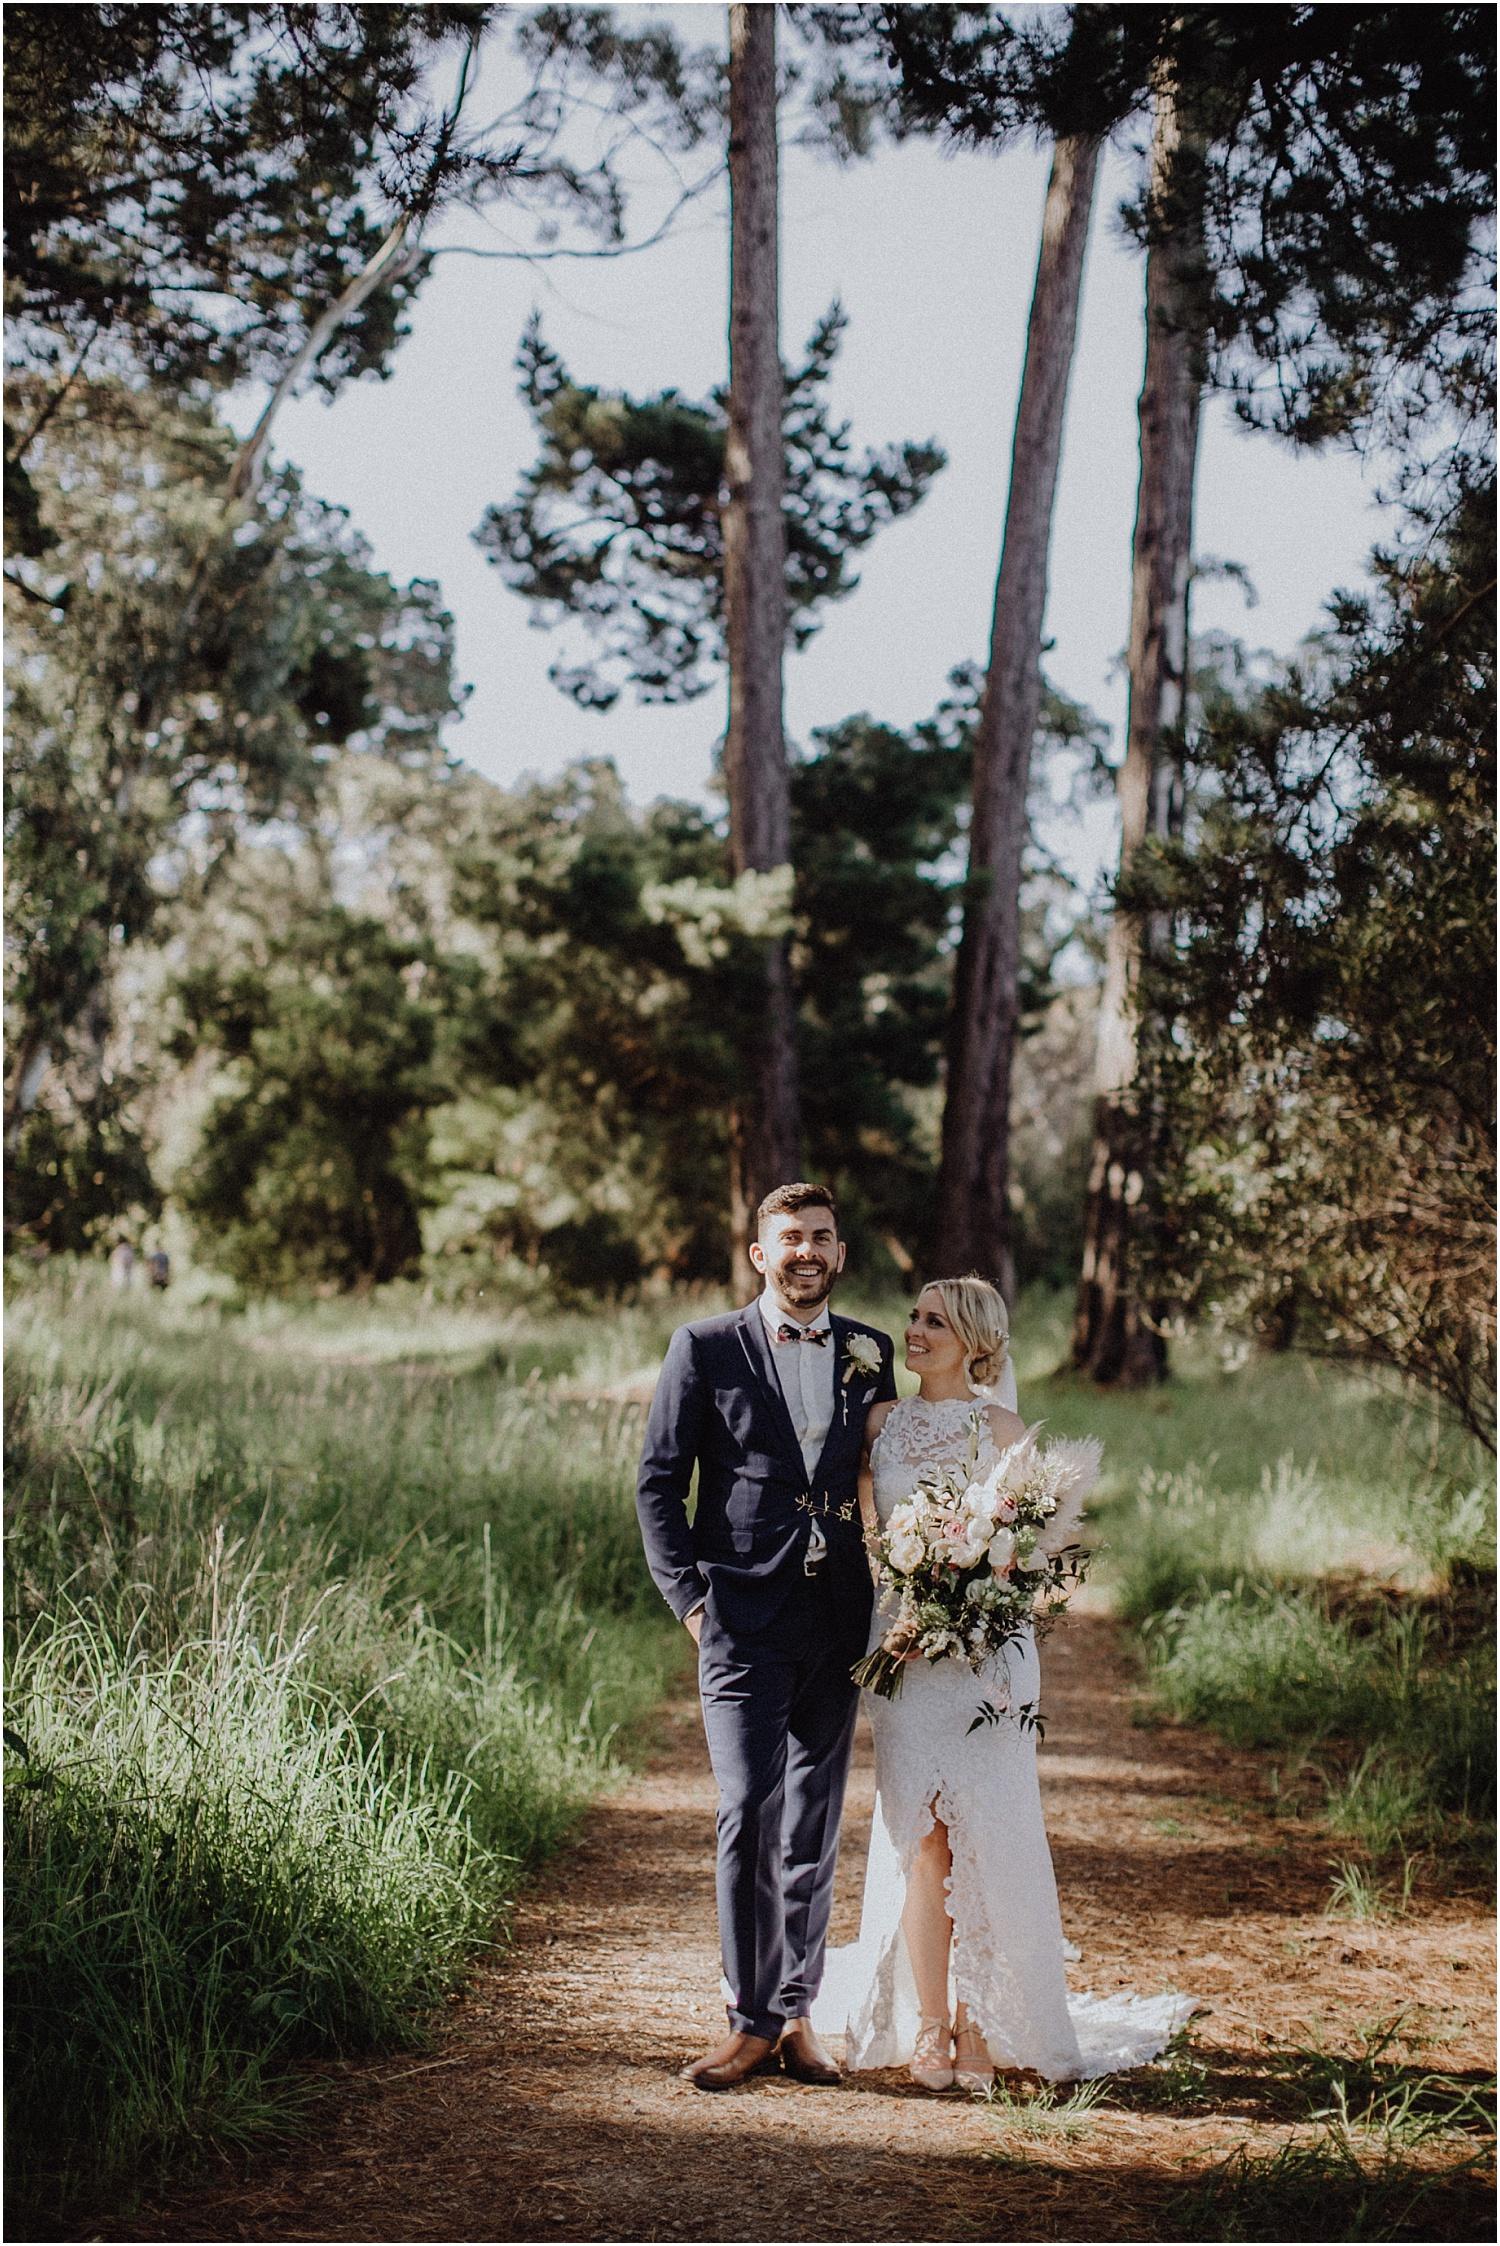 Nicolle and Damien's tipi wedding at the Flinders Yacht Club on the Mornington Peninsula._0125.jpg